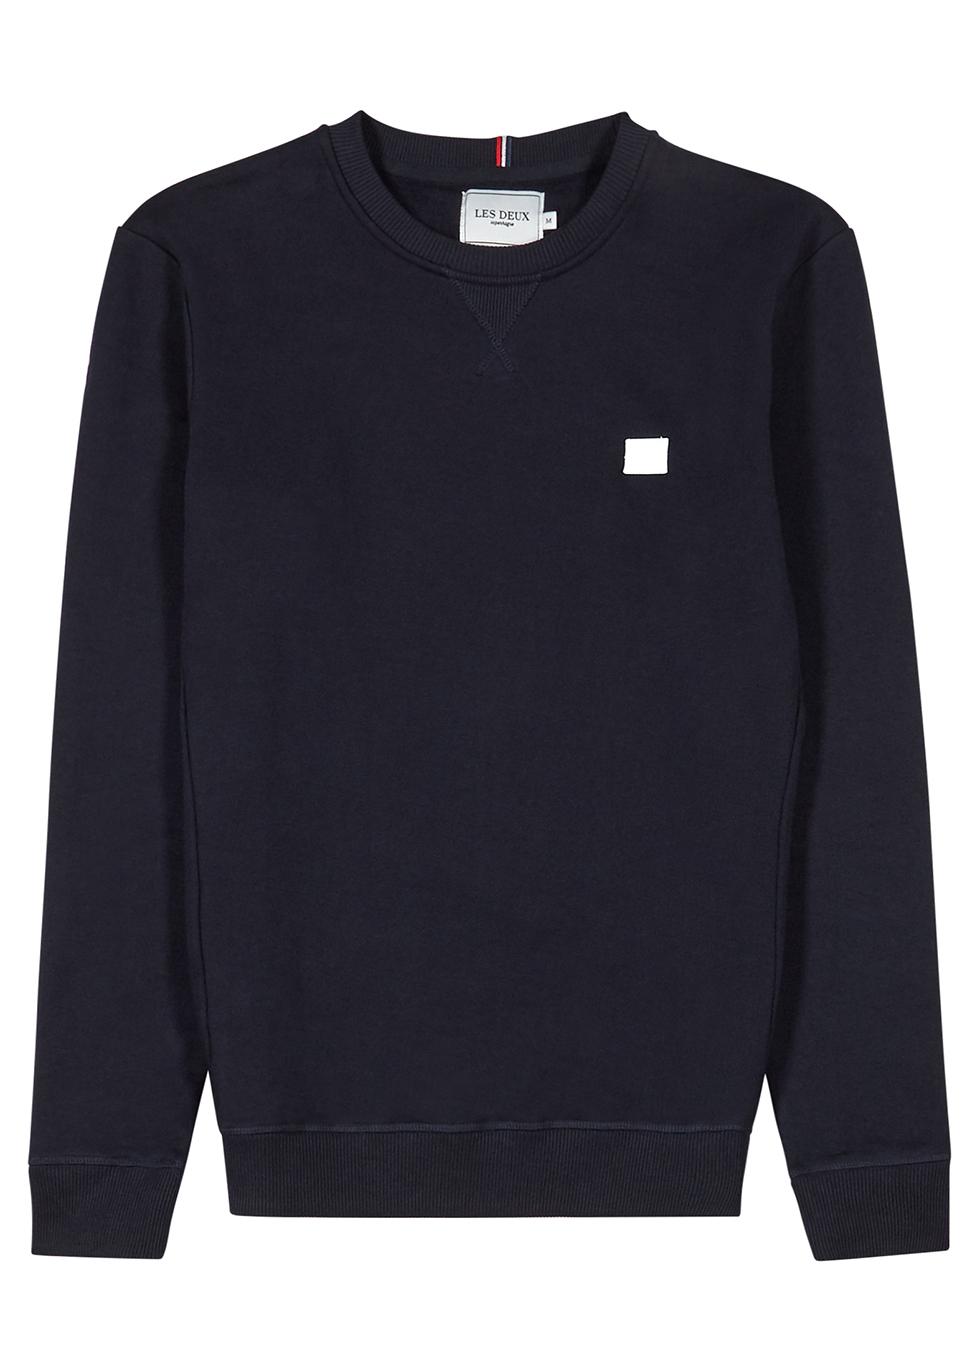 Les Deux Mens Regular Fit Encore Sweatshirt Light Brown